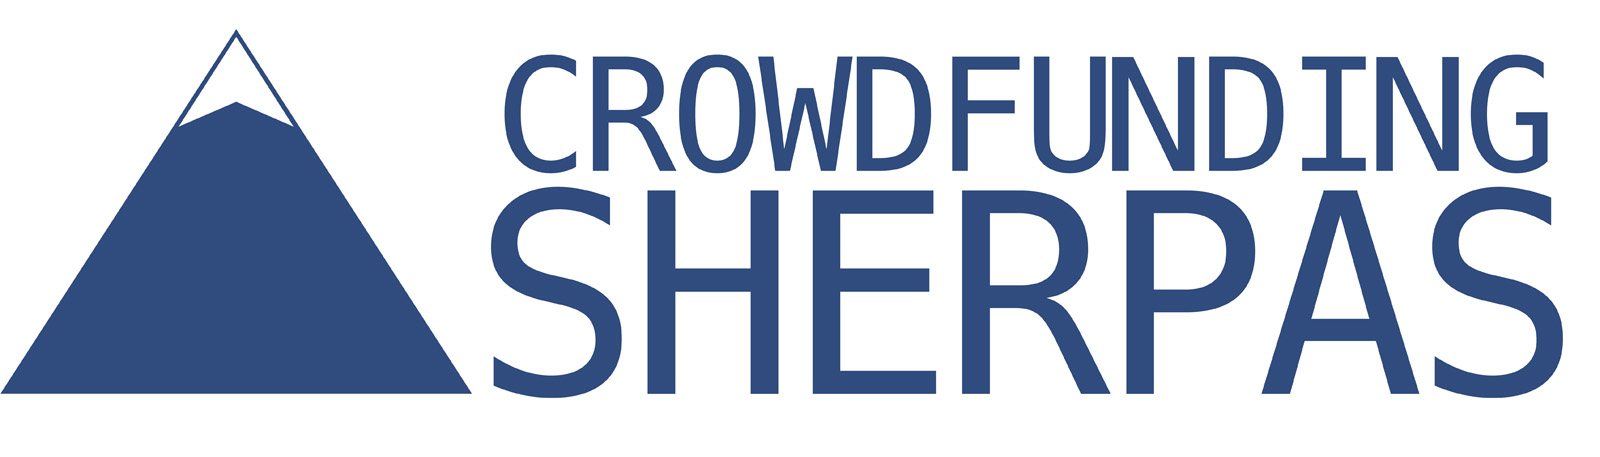 Crowdfunding Sherpas